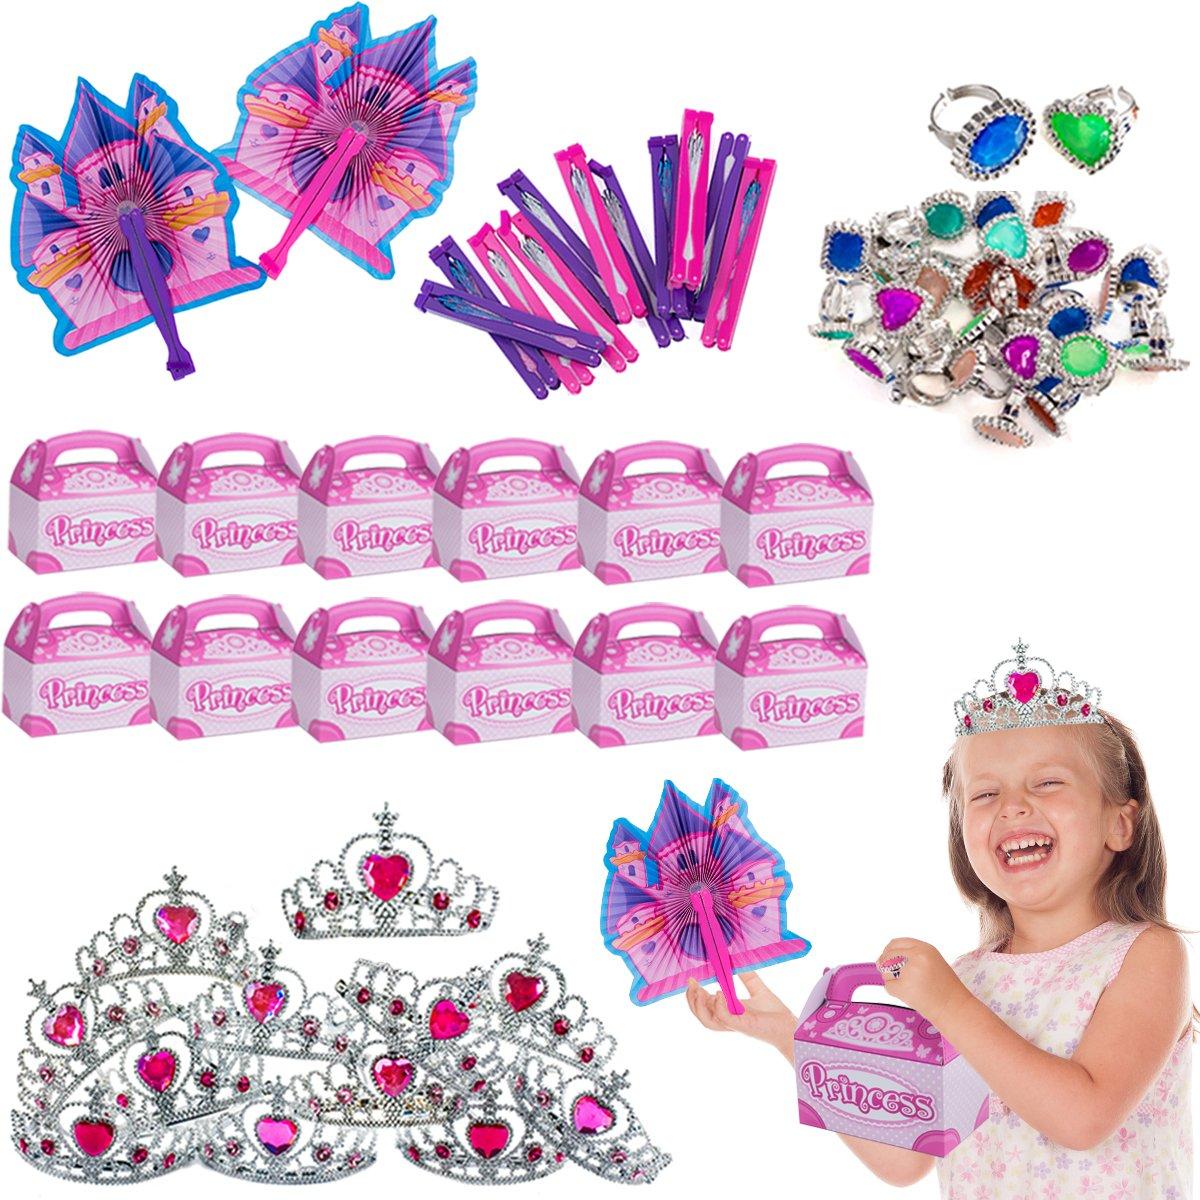 Princess Party Supplies - Party Favors - 72 Pc Set - Tiaras, Princess Fans, Treat Boxes & Princess Rings by Funny Party Hats